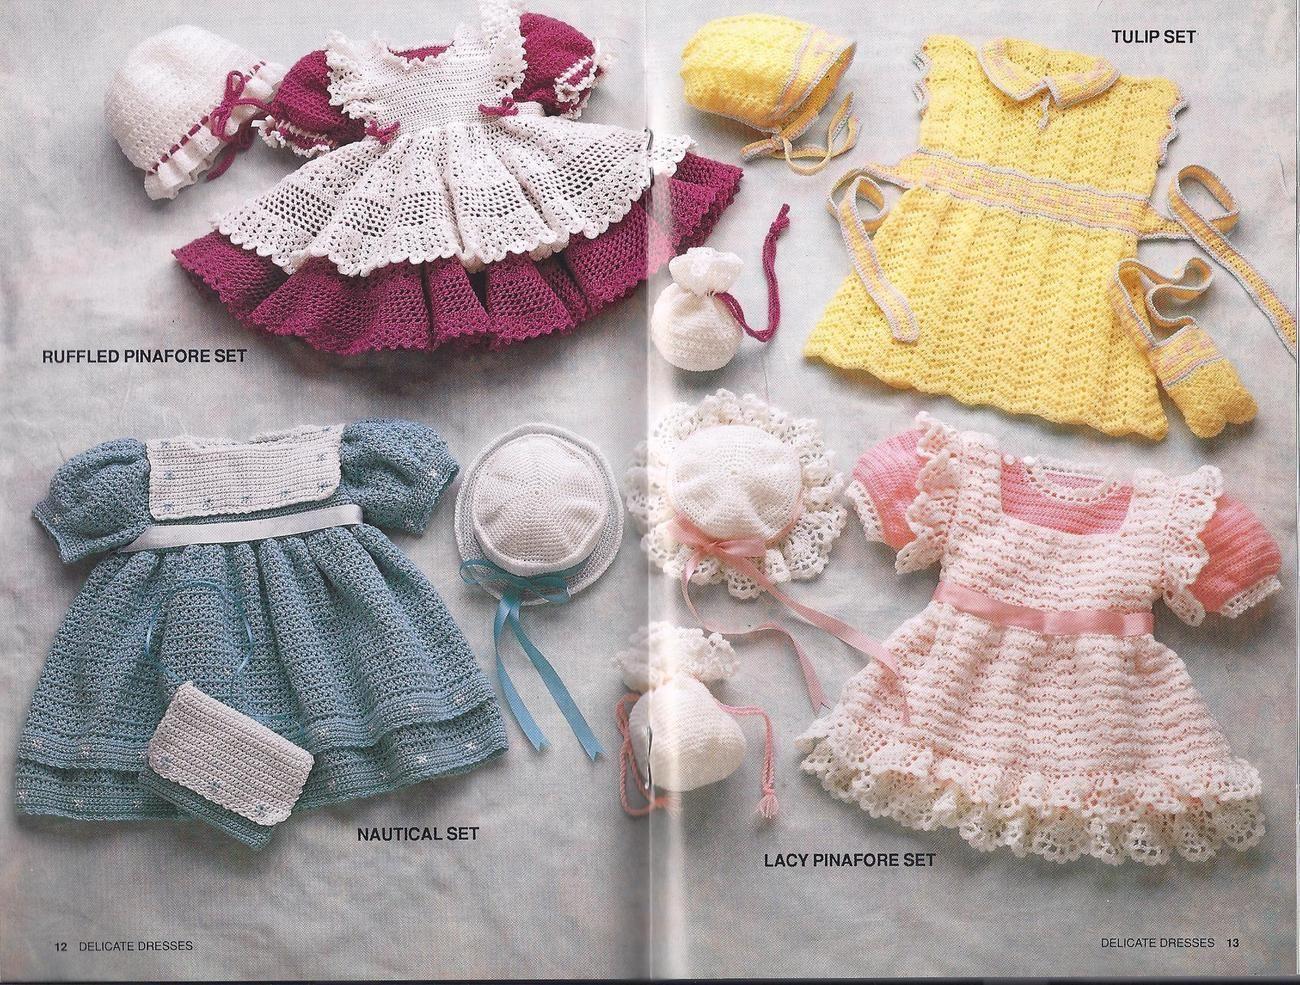 Free Crochet Baby Dress Patterns | Crochet Dresses Patterns | Crochet Guild - 264 Best Cabbage Patch/Premie Clothes Images On Pinterest